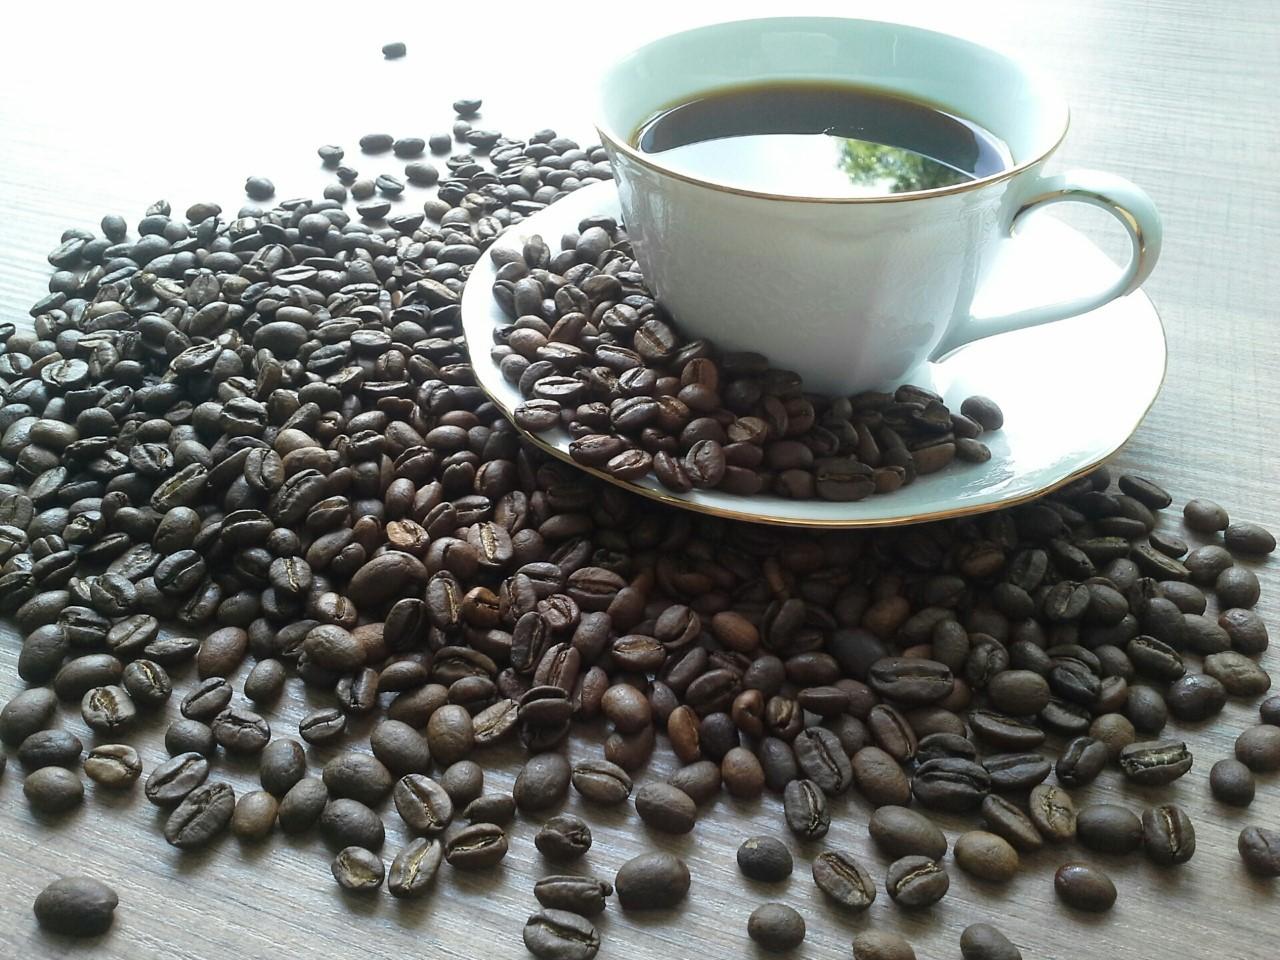 【Honeys 】薩爾瓦多溫泉咖啡(耳掛包) (10包入)